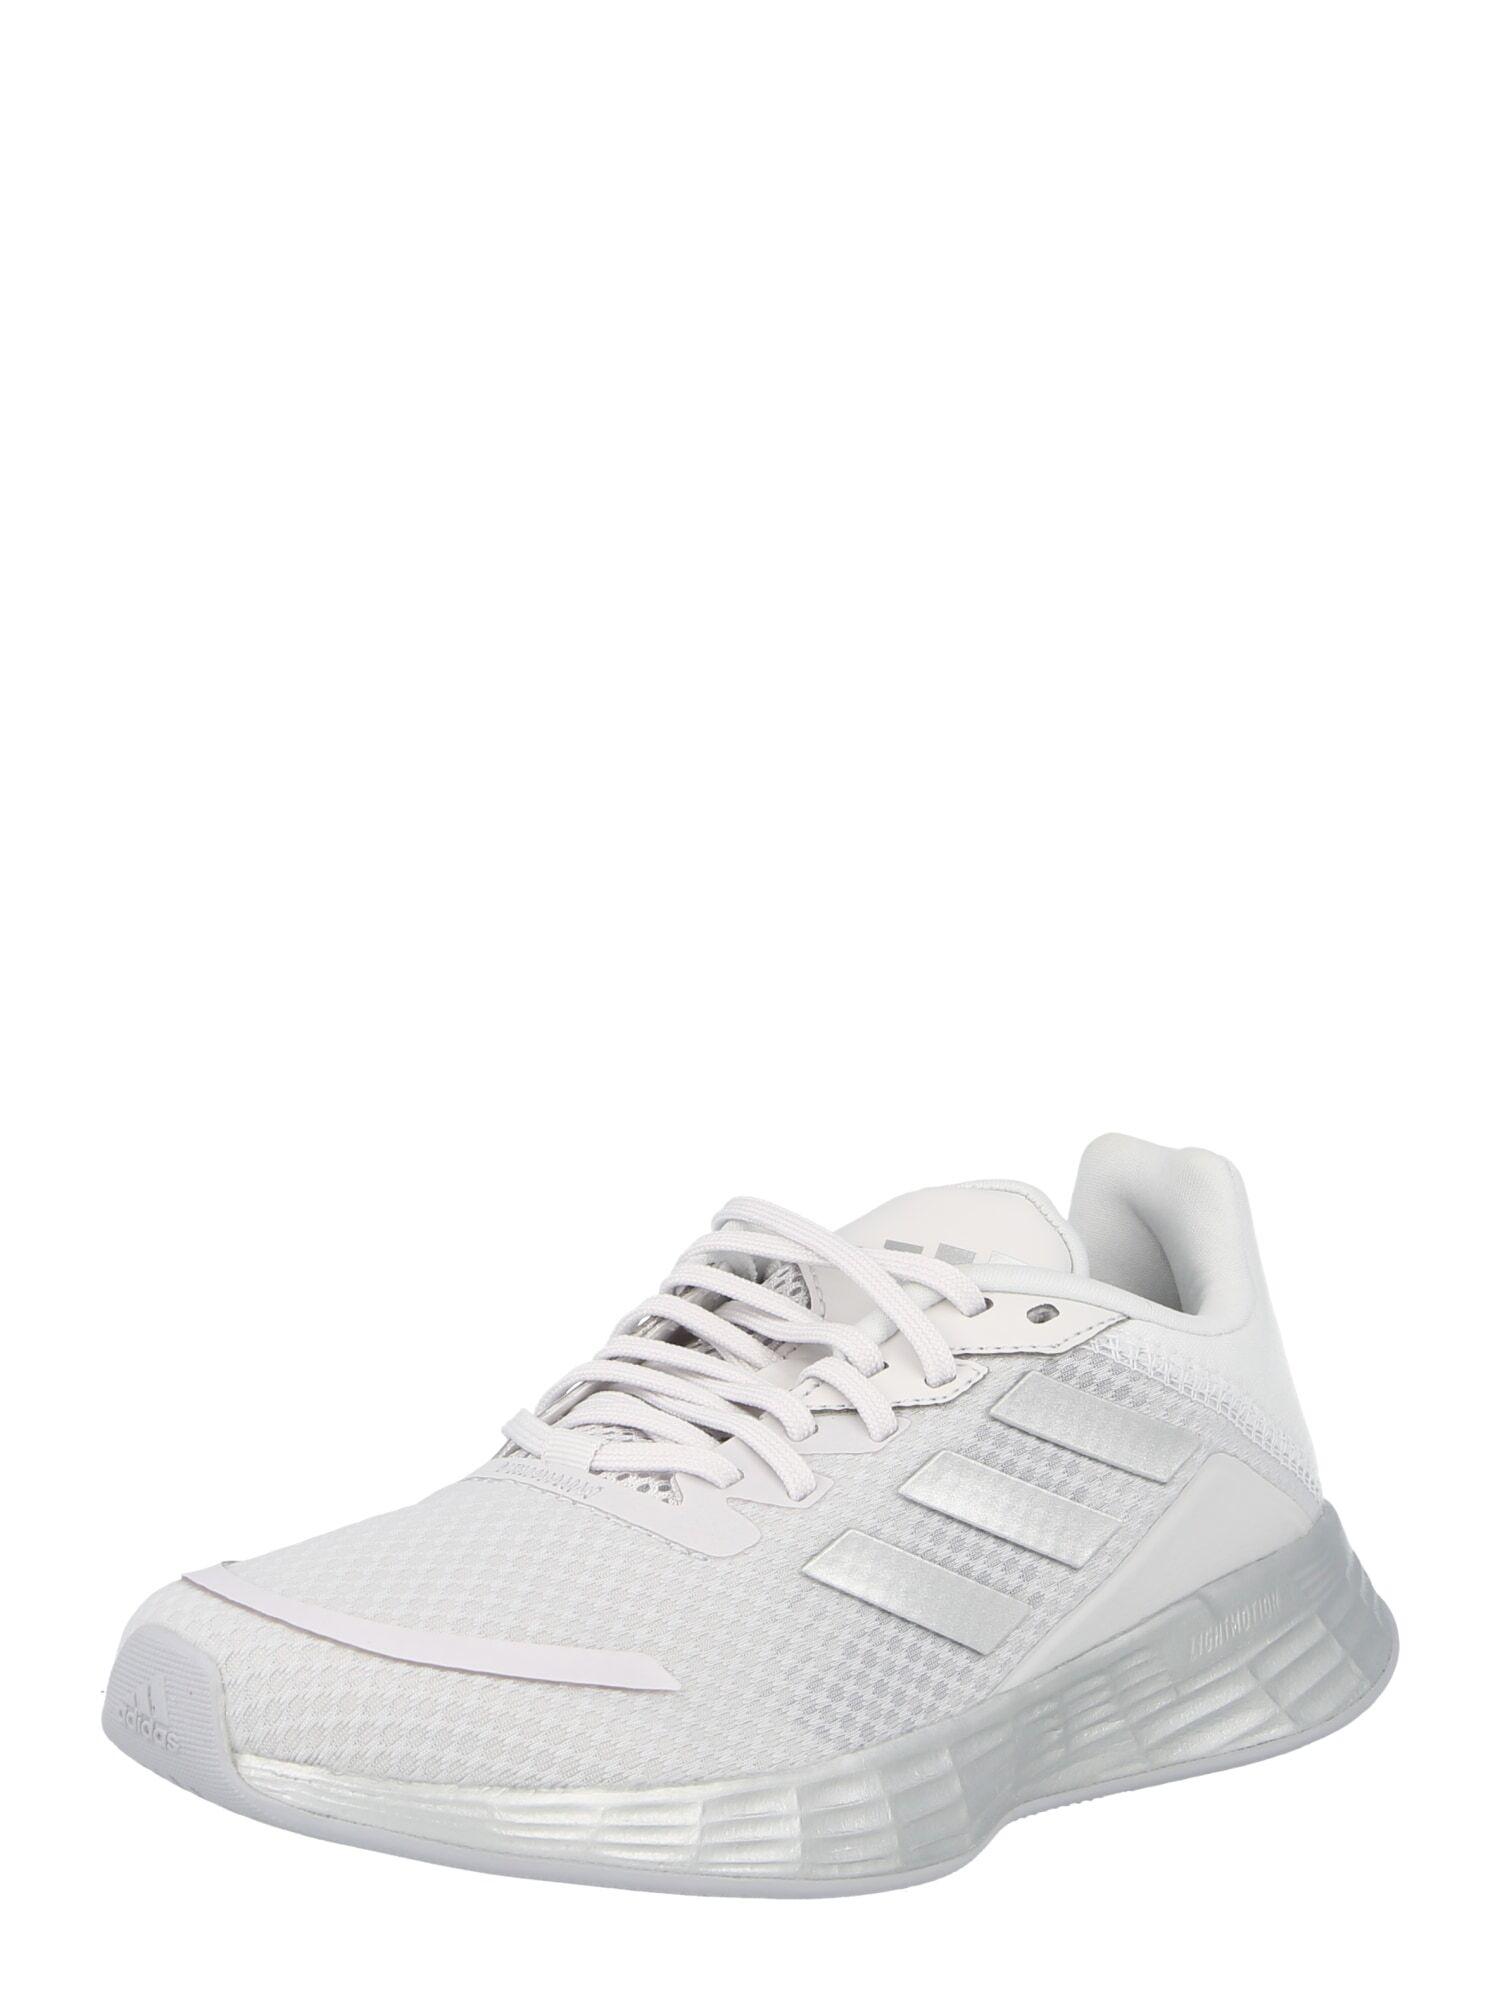 ADIDAS PERFORMANCE Chaussure de course 'Duramo'  - Blanc - Taille: 7 - male